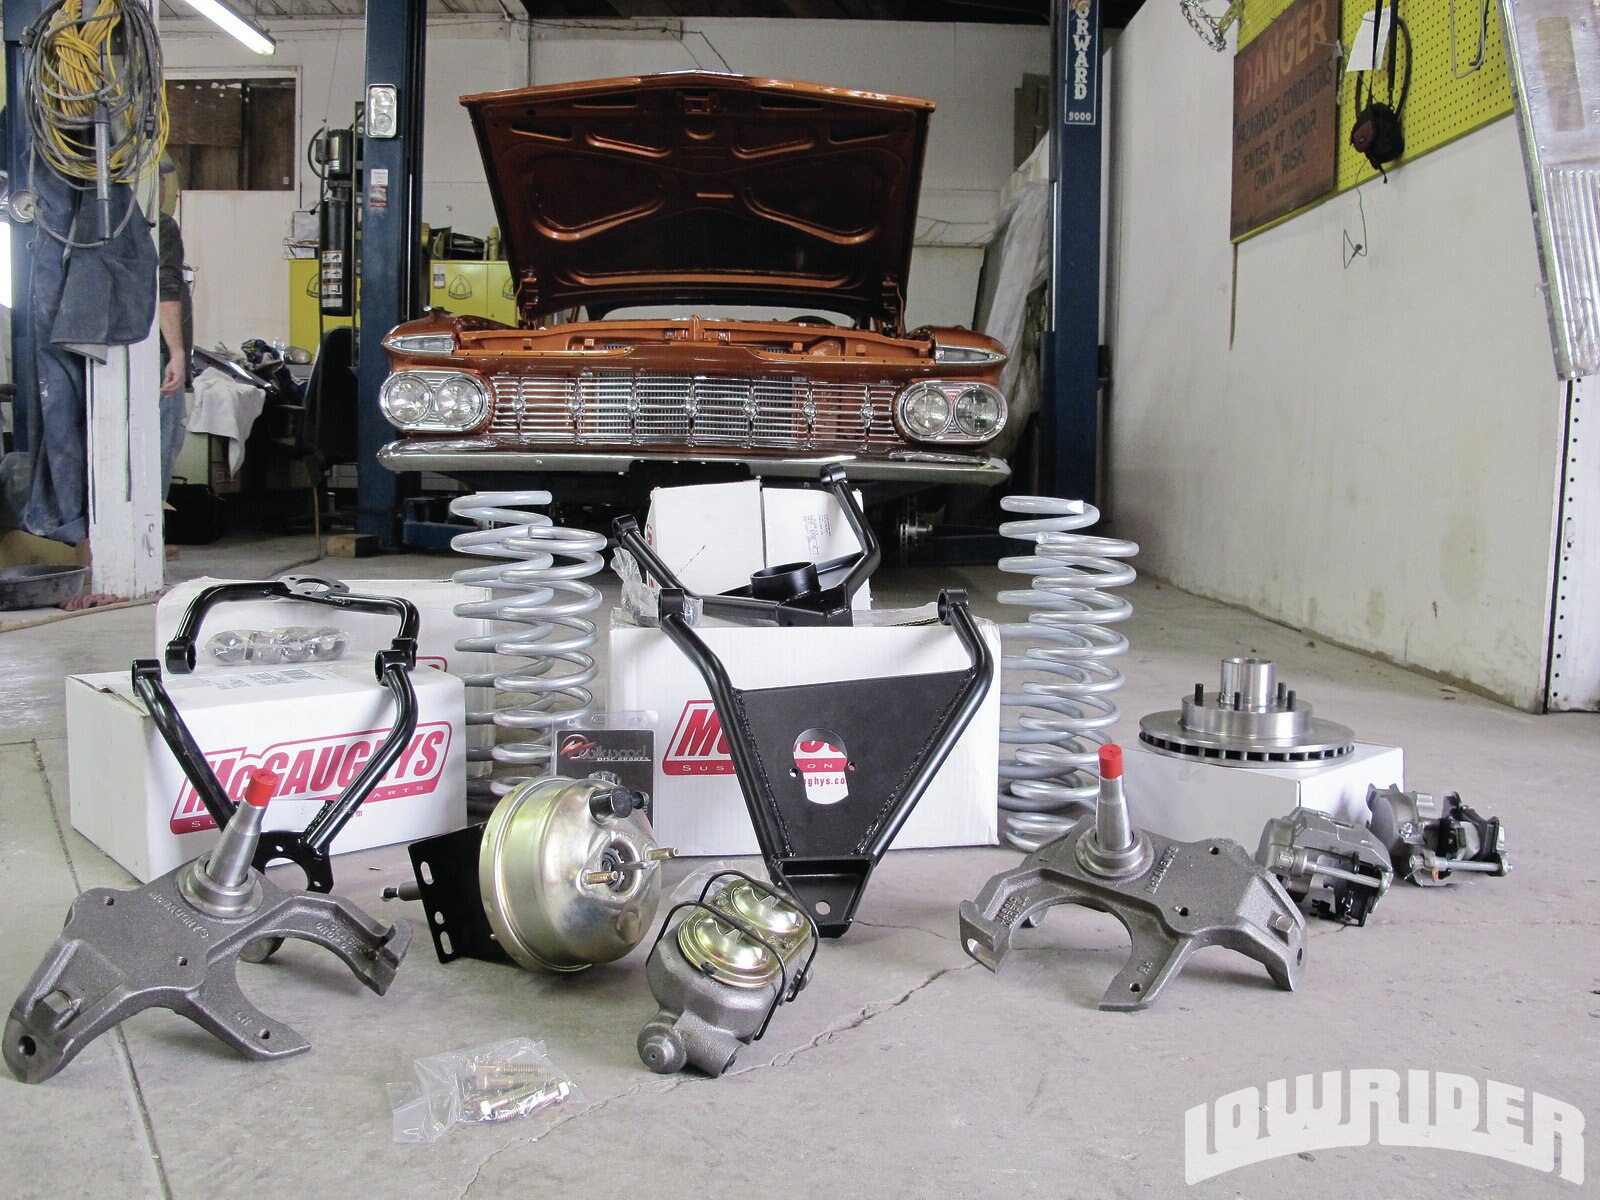 1209-lrmp-01-o-McGaughy-spindle-kit-mcgaughy-setup1